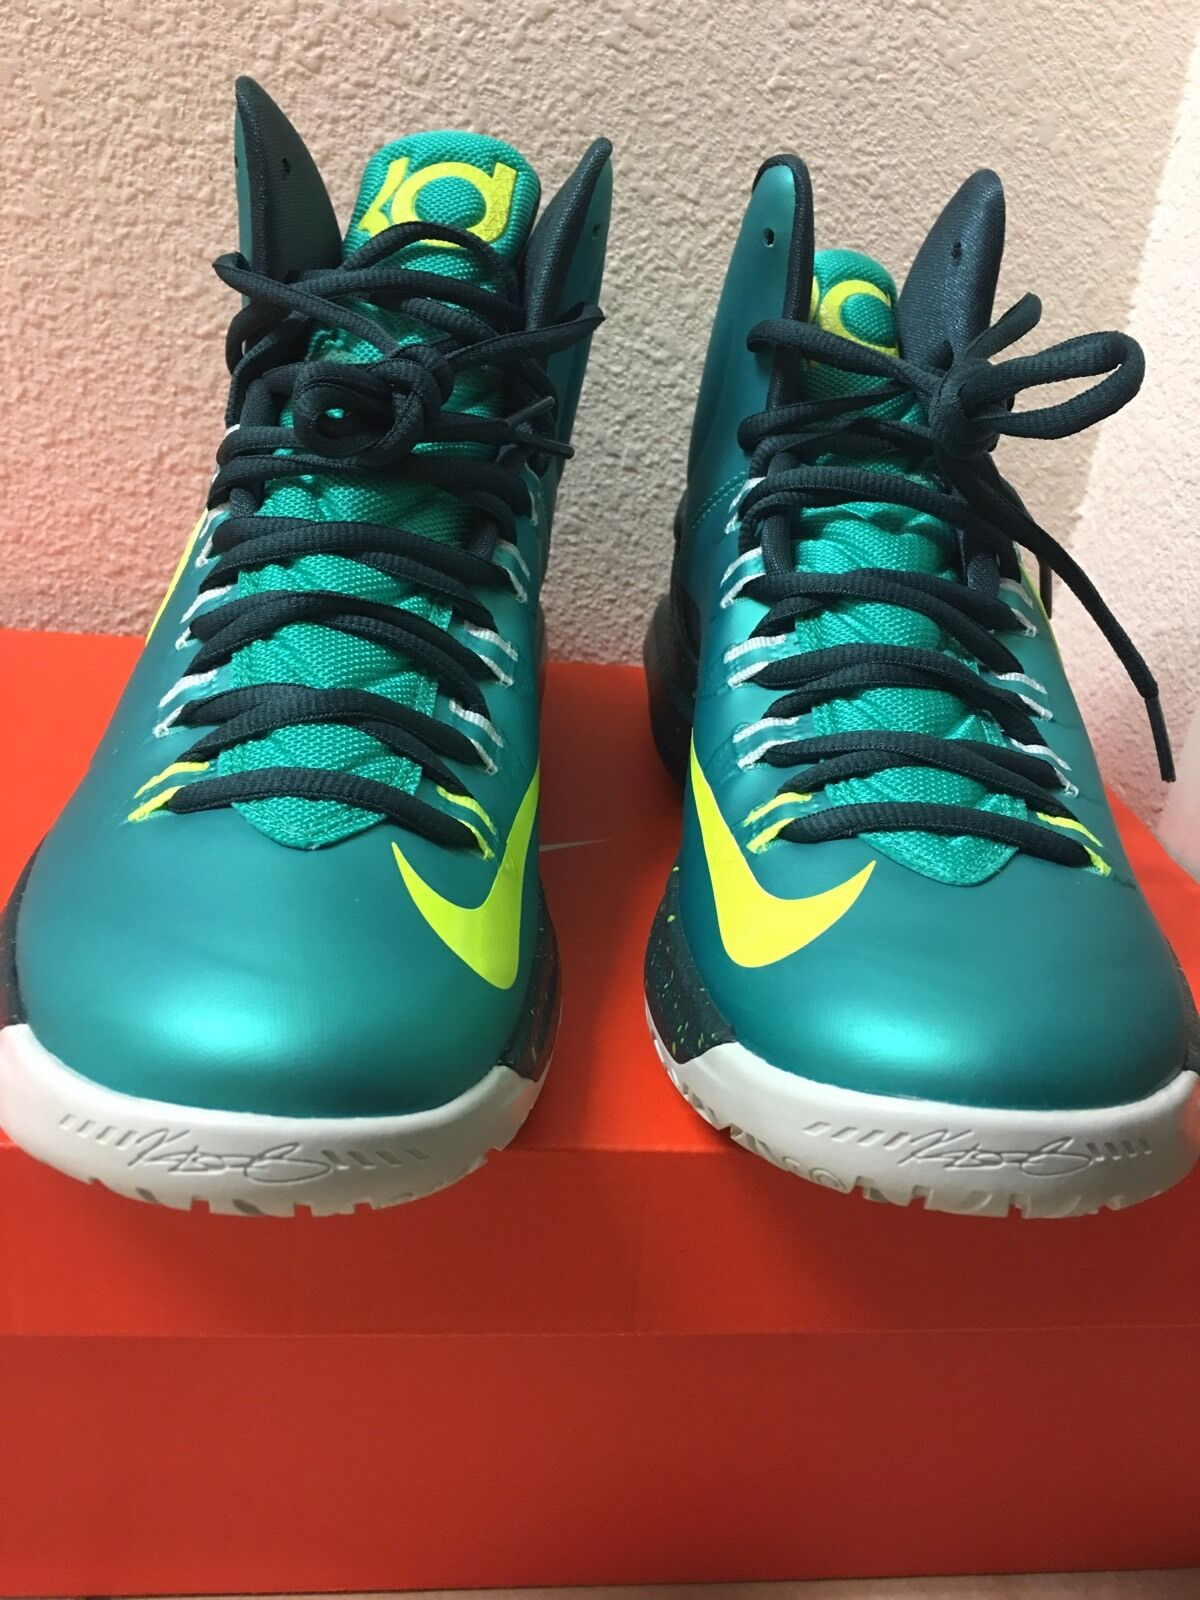 Nike KD 5 Kevin Durant  Hulk  Men's Size 9.5 Atomic Teal Volt Dark Atomic Real